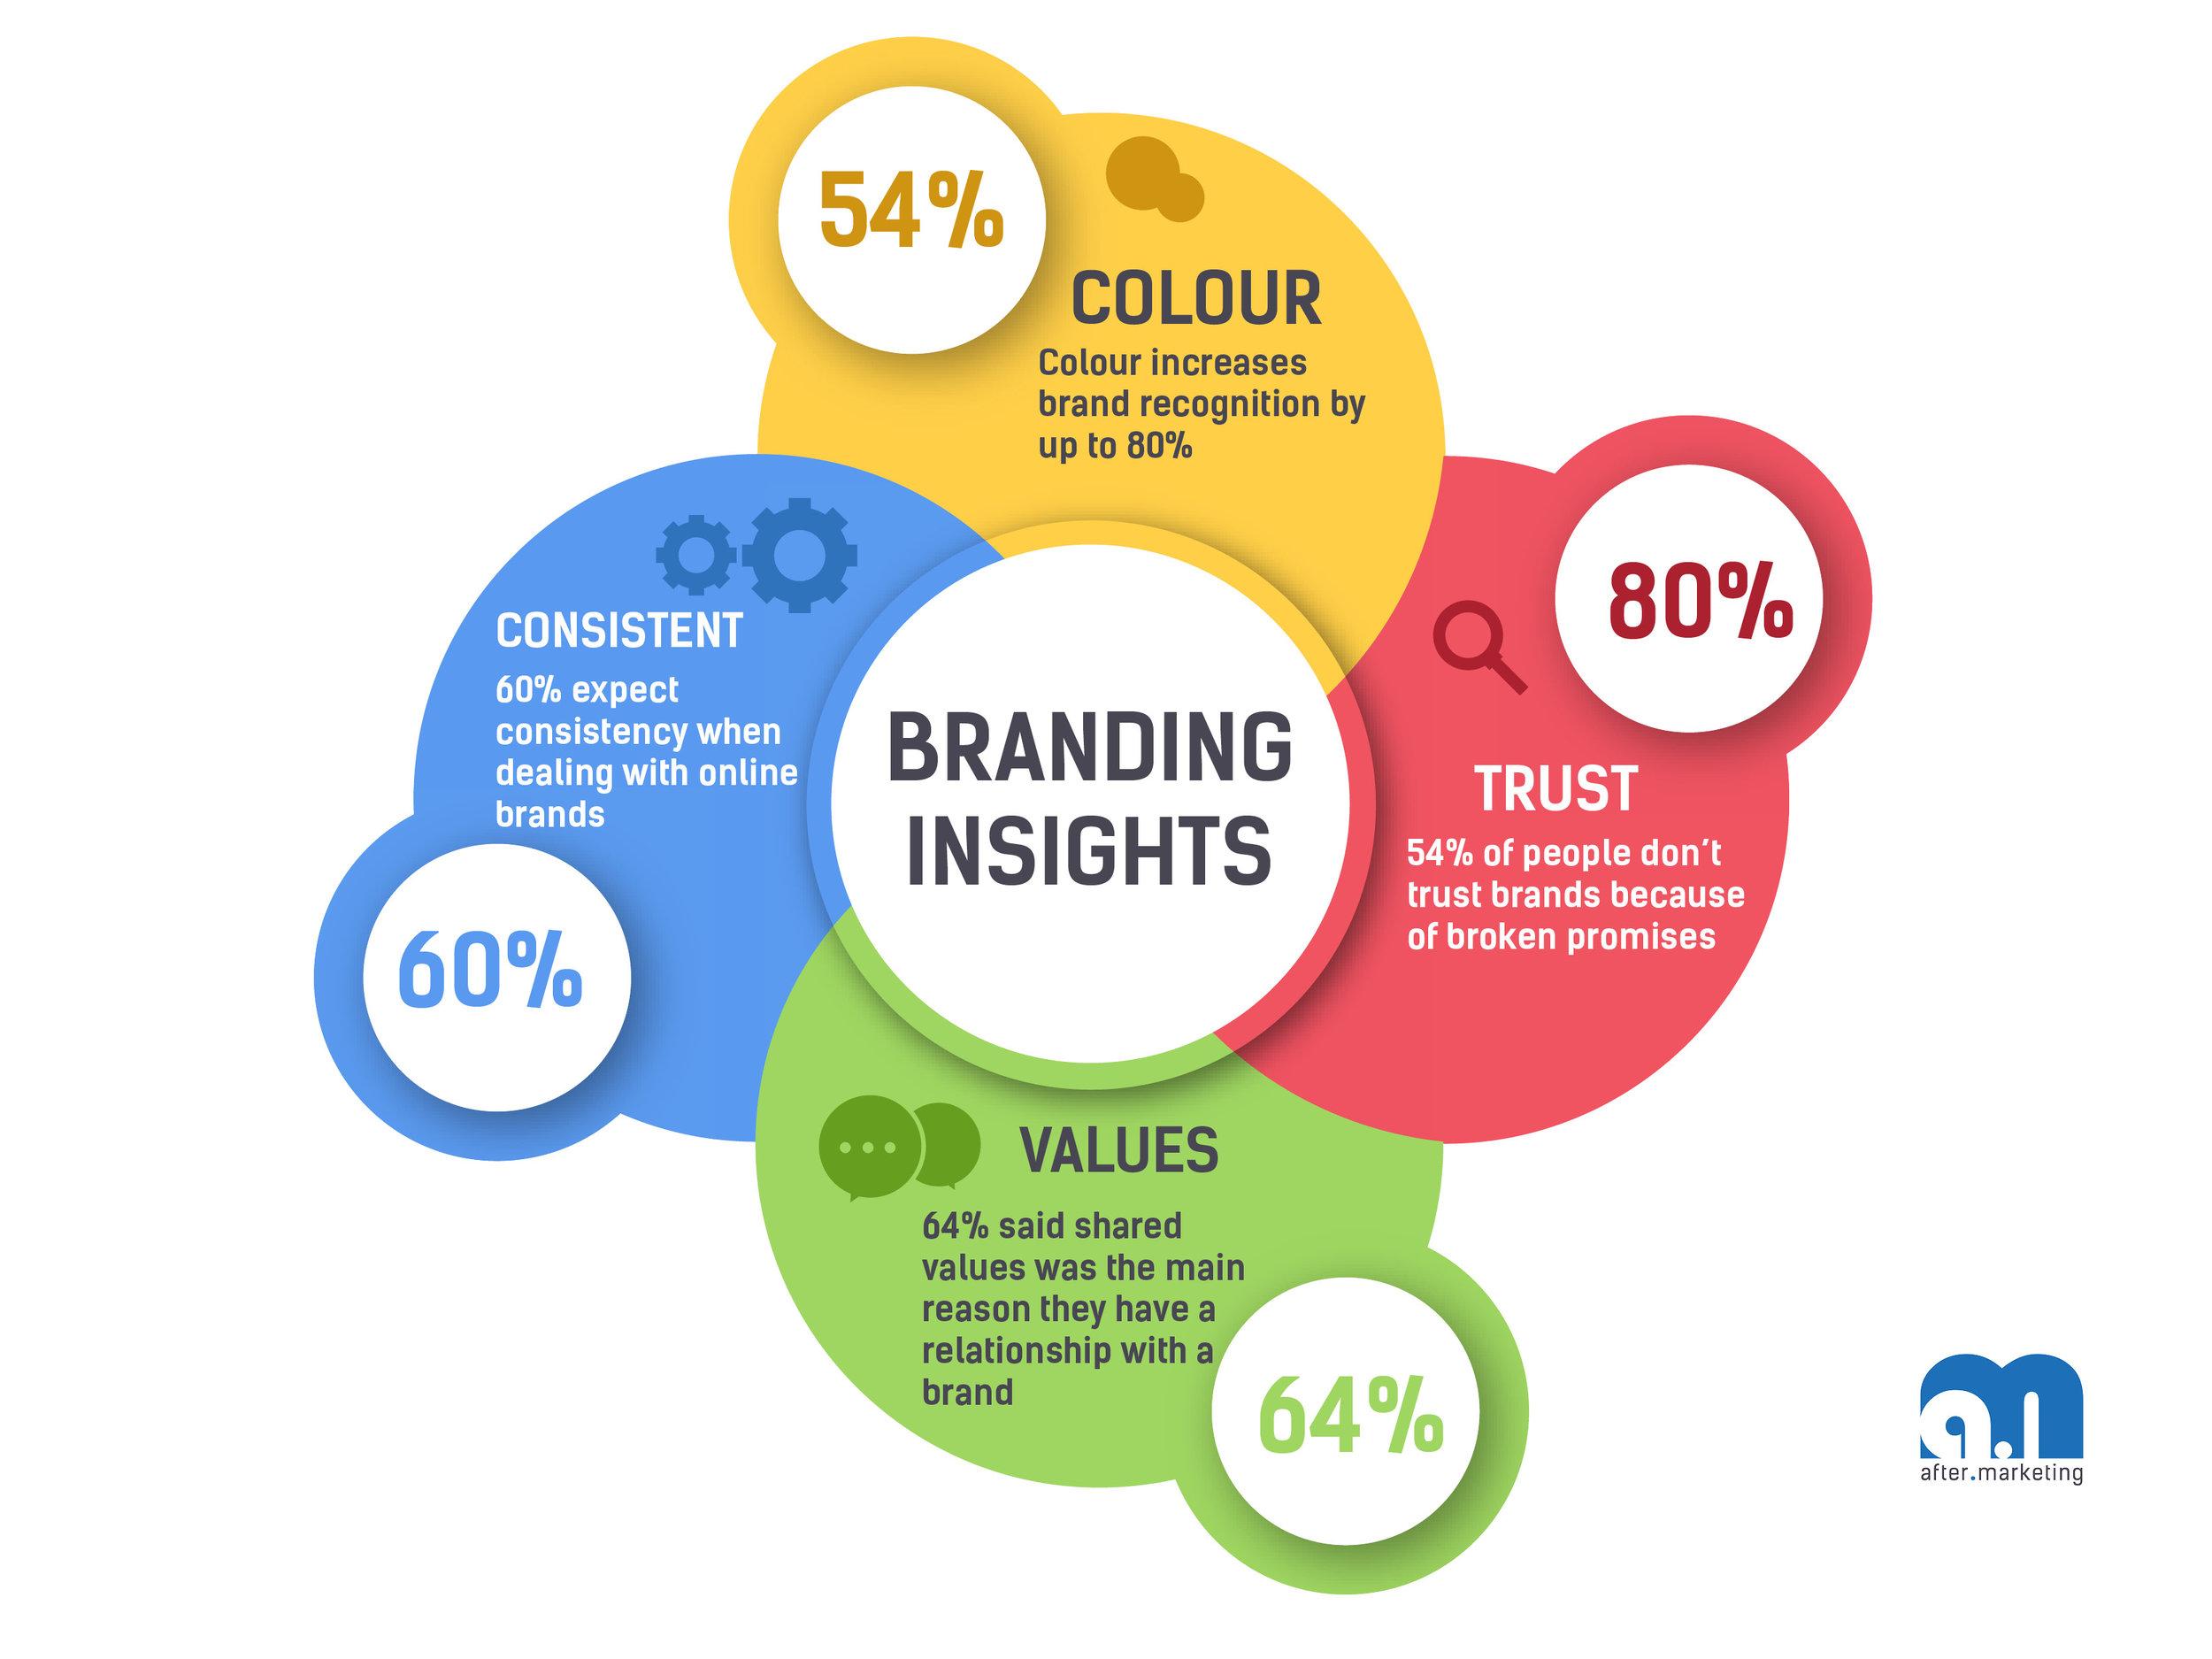 Branding-insights.jpg